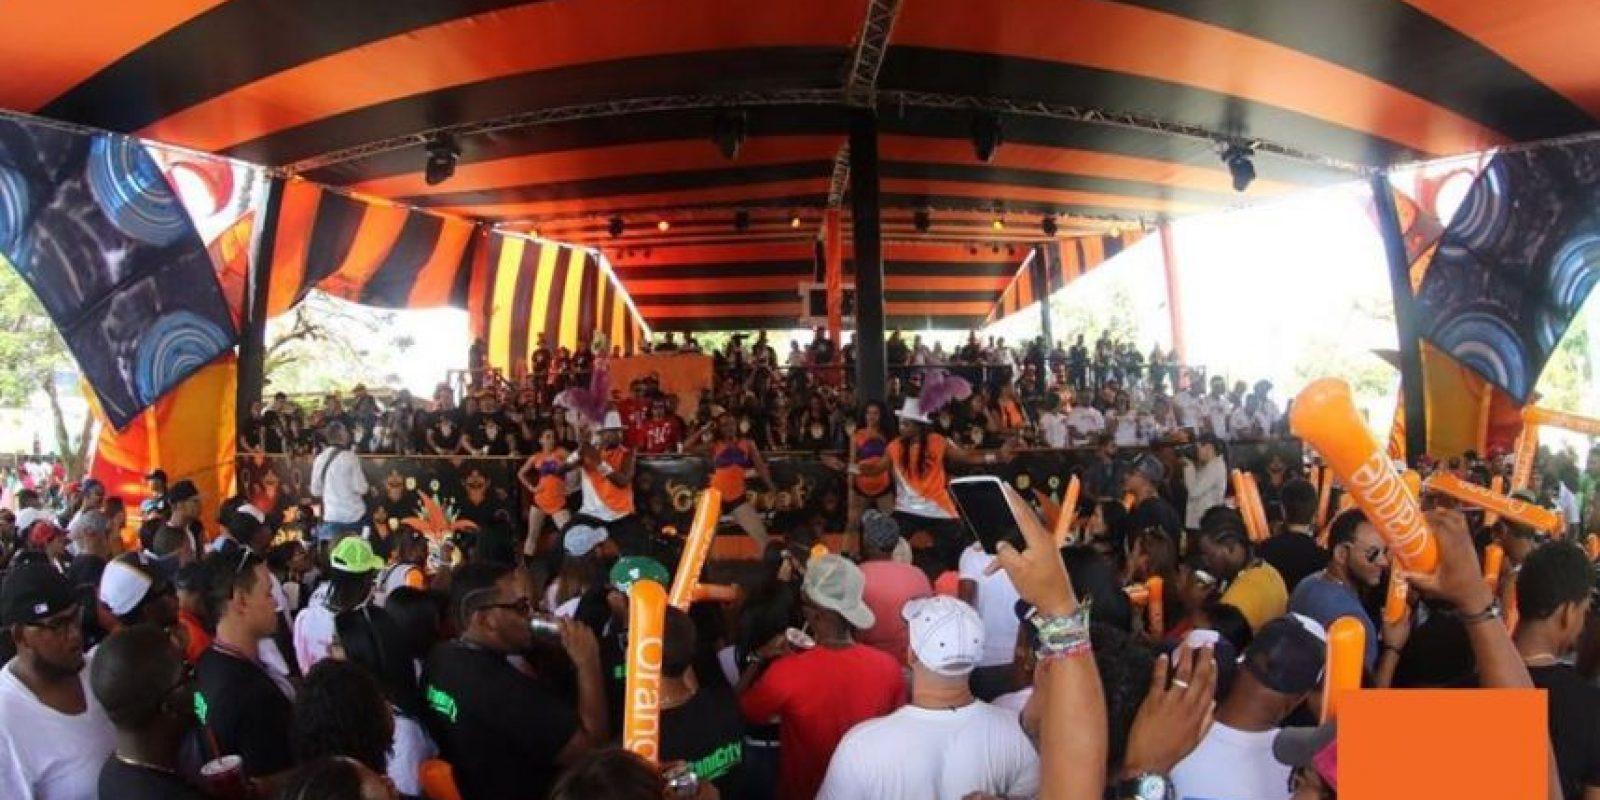 Vista panorámica de la Zona VIP Orange en La Vega. Foto:Fuente Externa